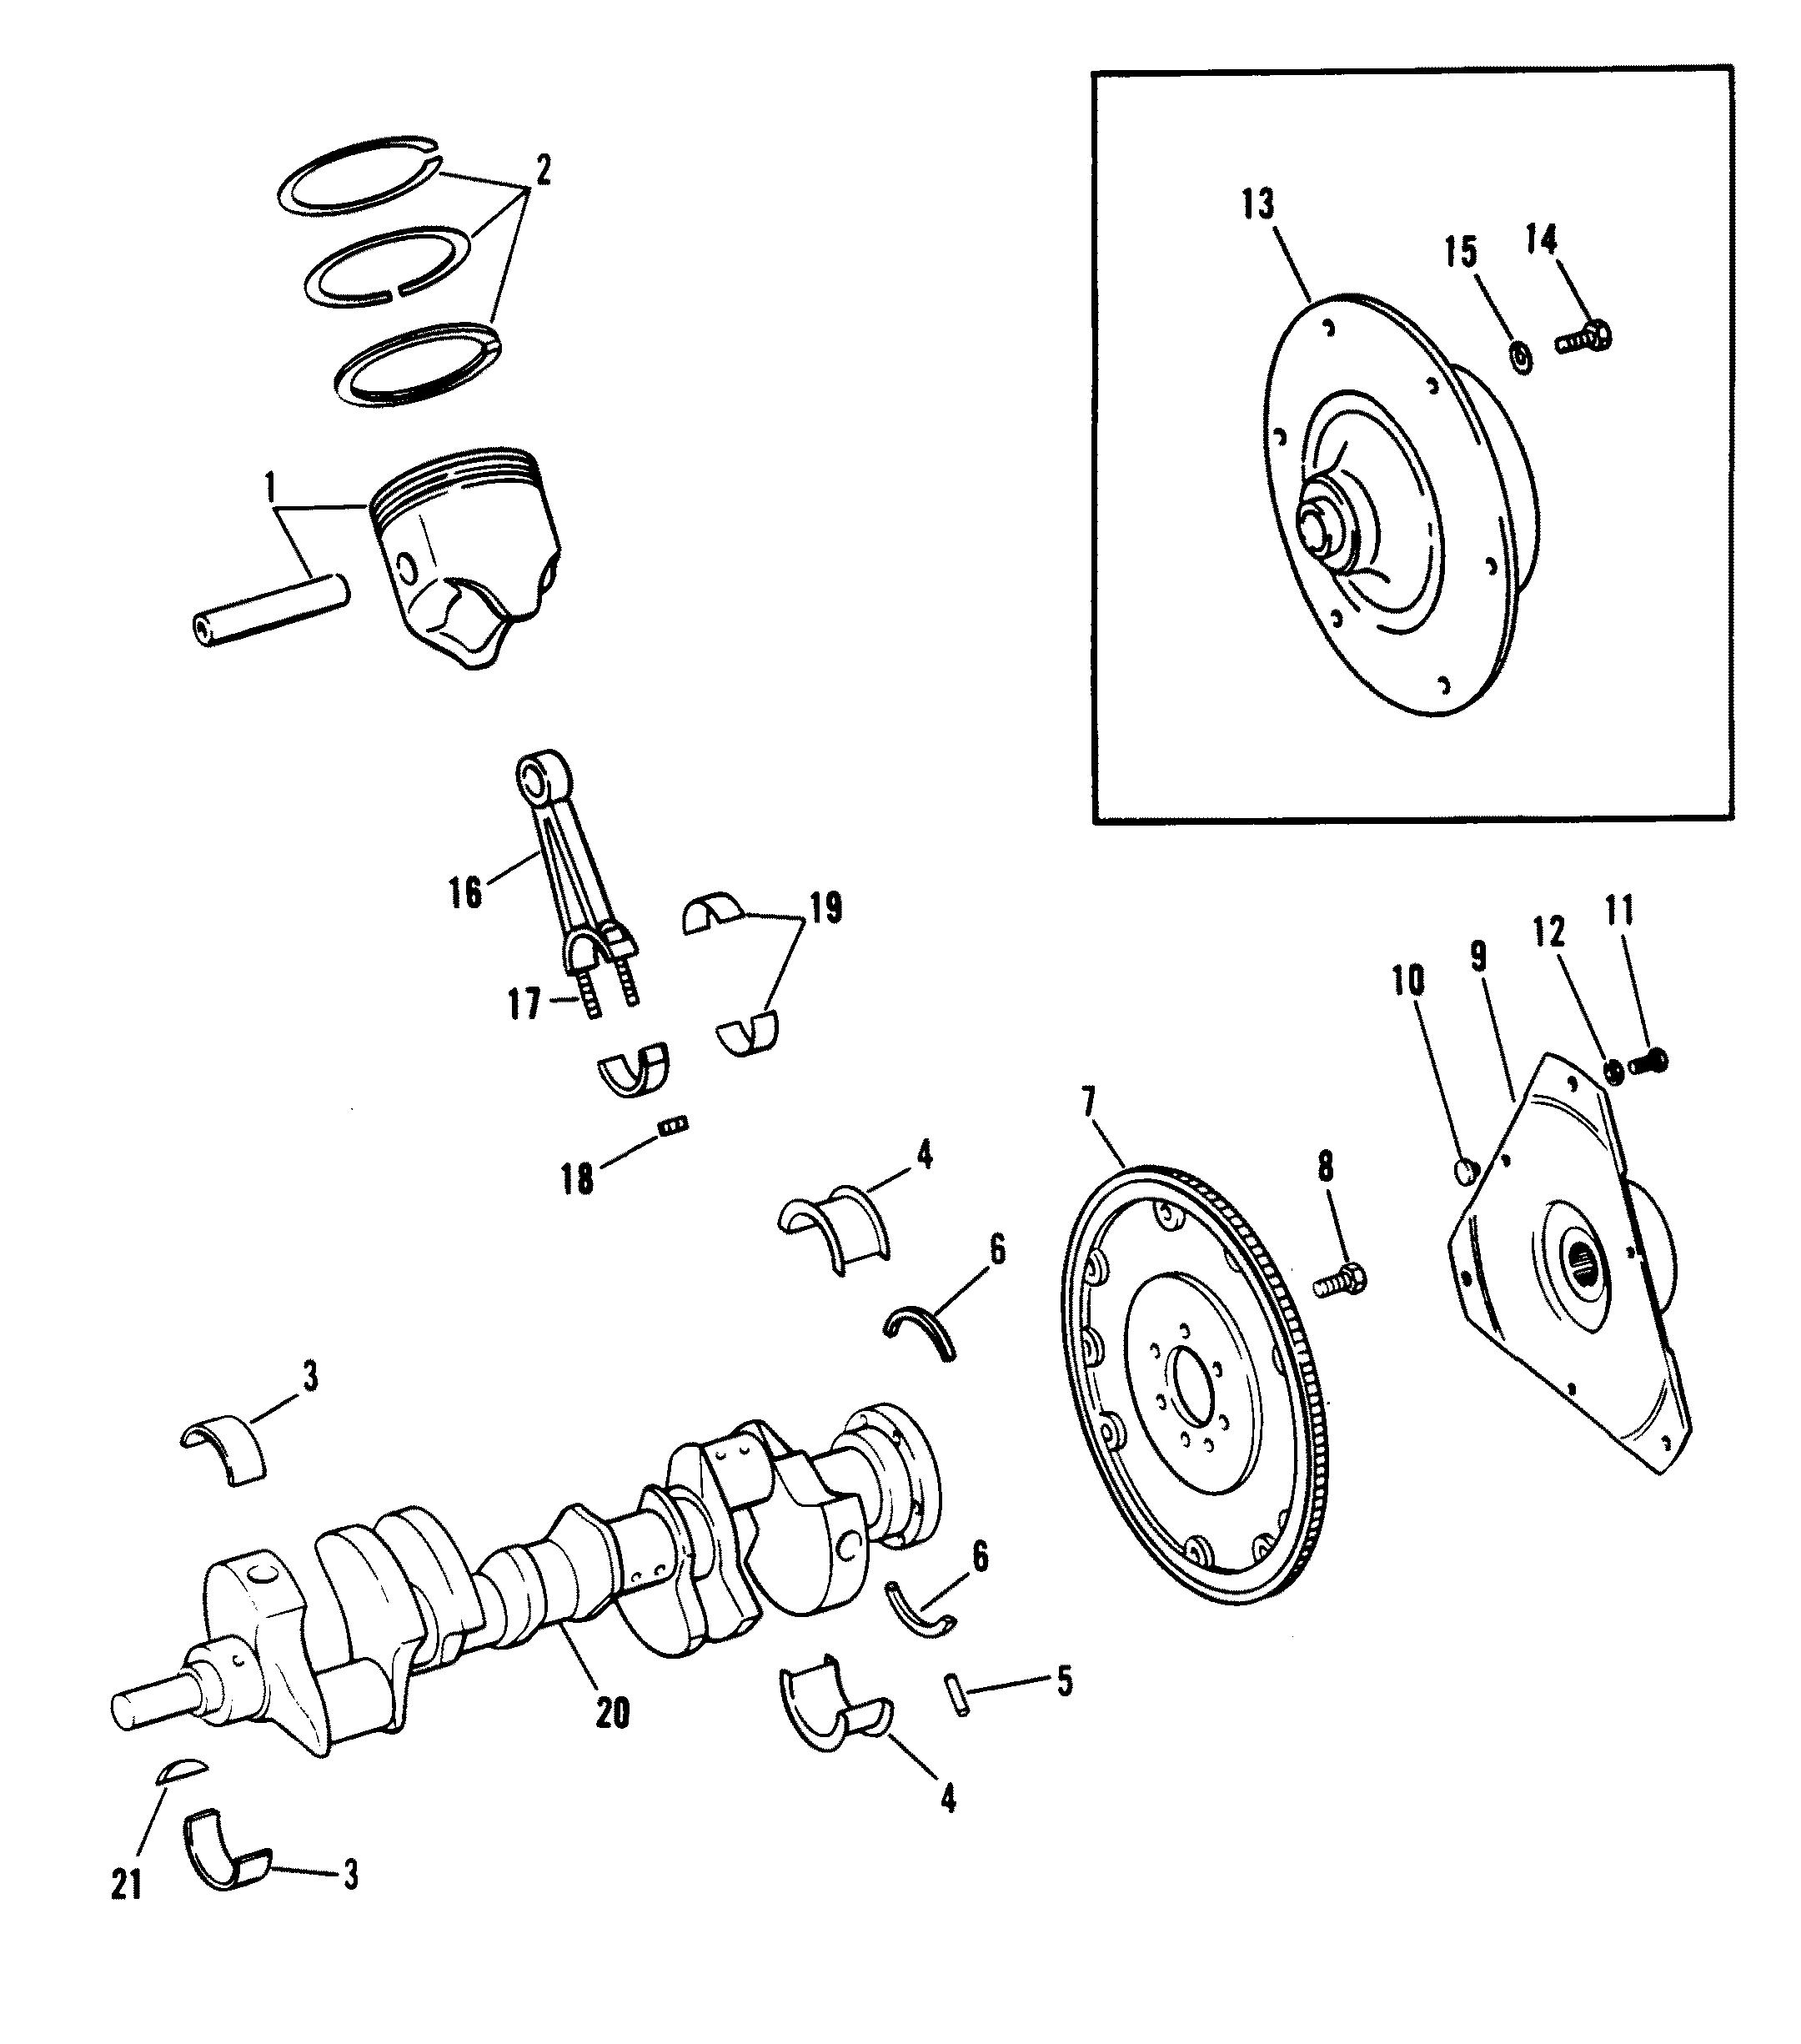 Hardin Marine - Crankshaft, Pistons And Connecting Rods